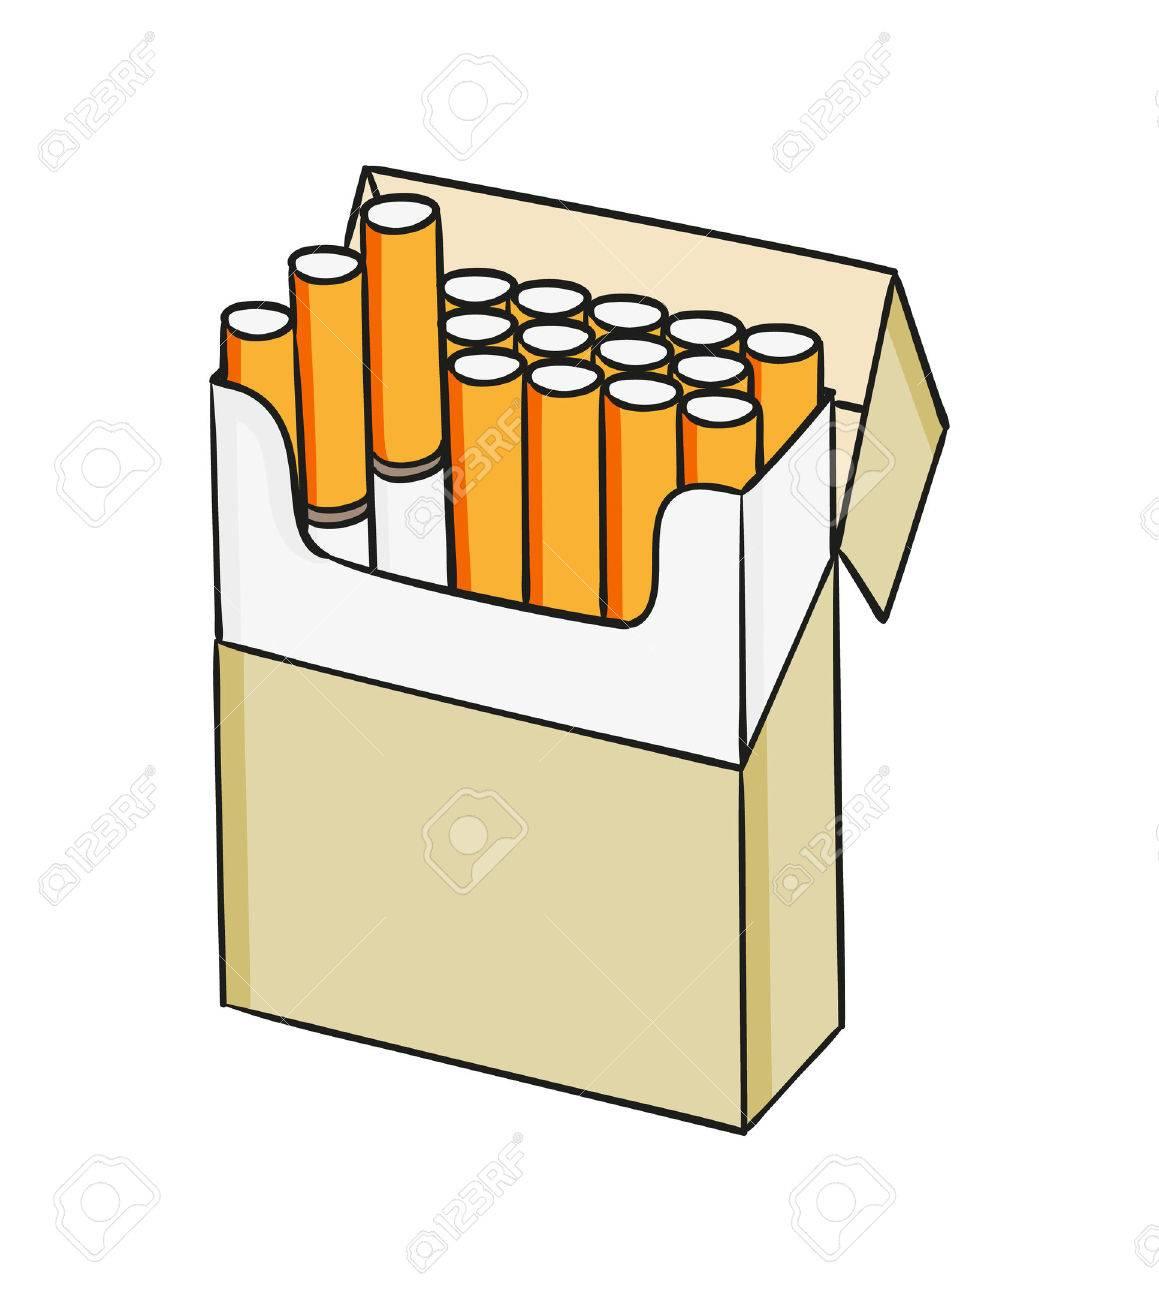 Cigarette pack clipart banner download Cigarette pack clipart 5 » Clipart Station banner download